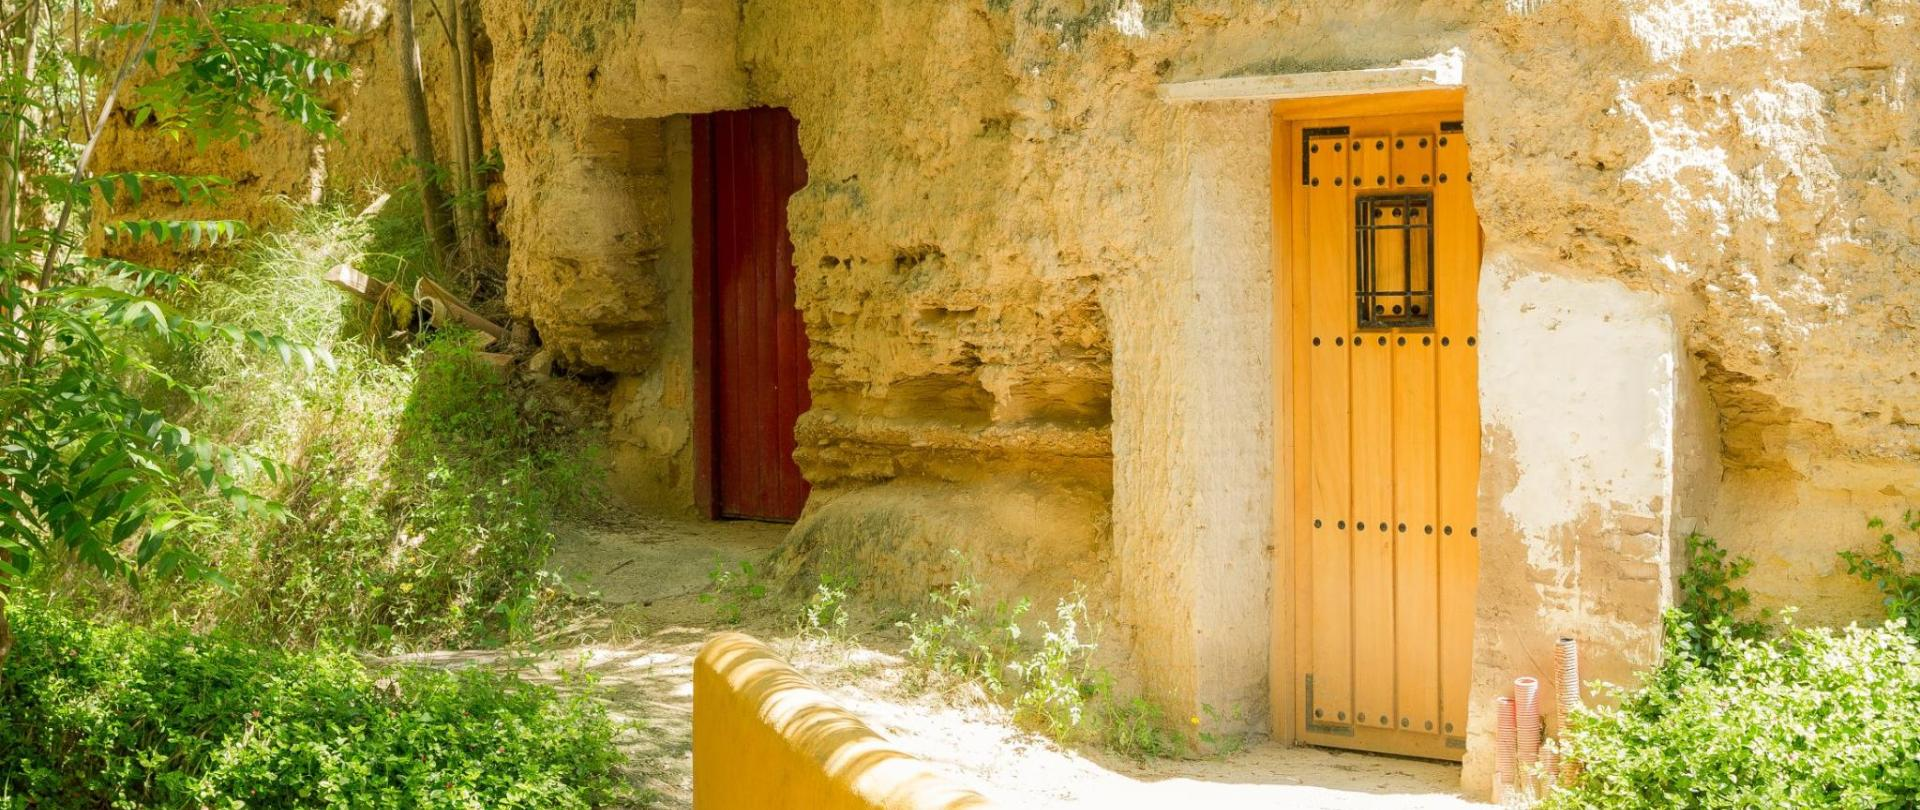 resized_2018_01 Exterior cuevas de Valtierra-5.jpg